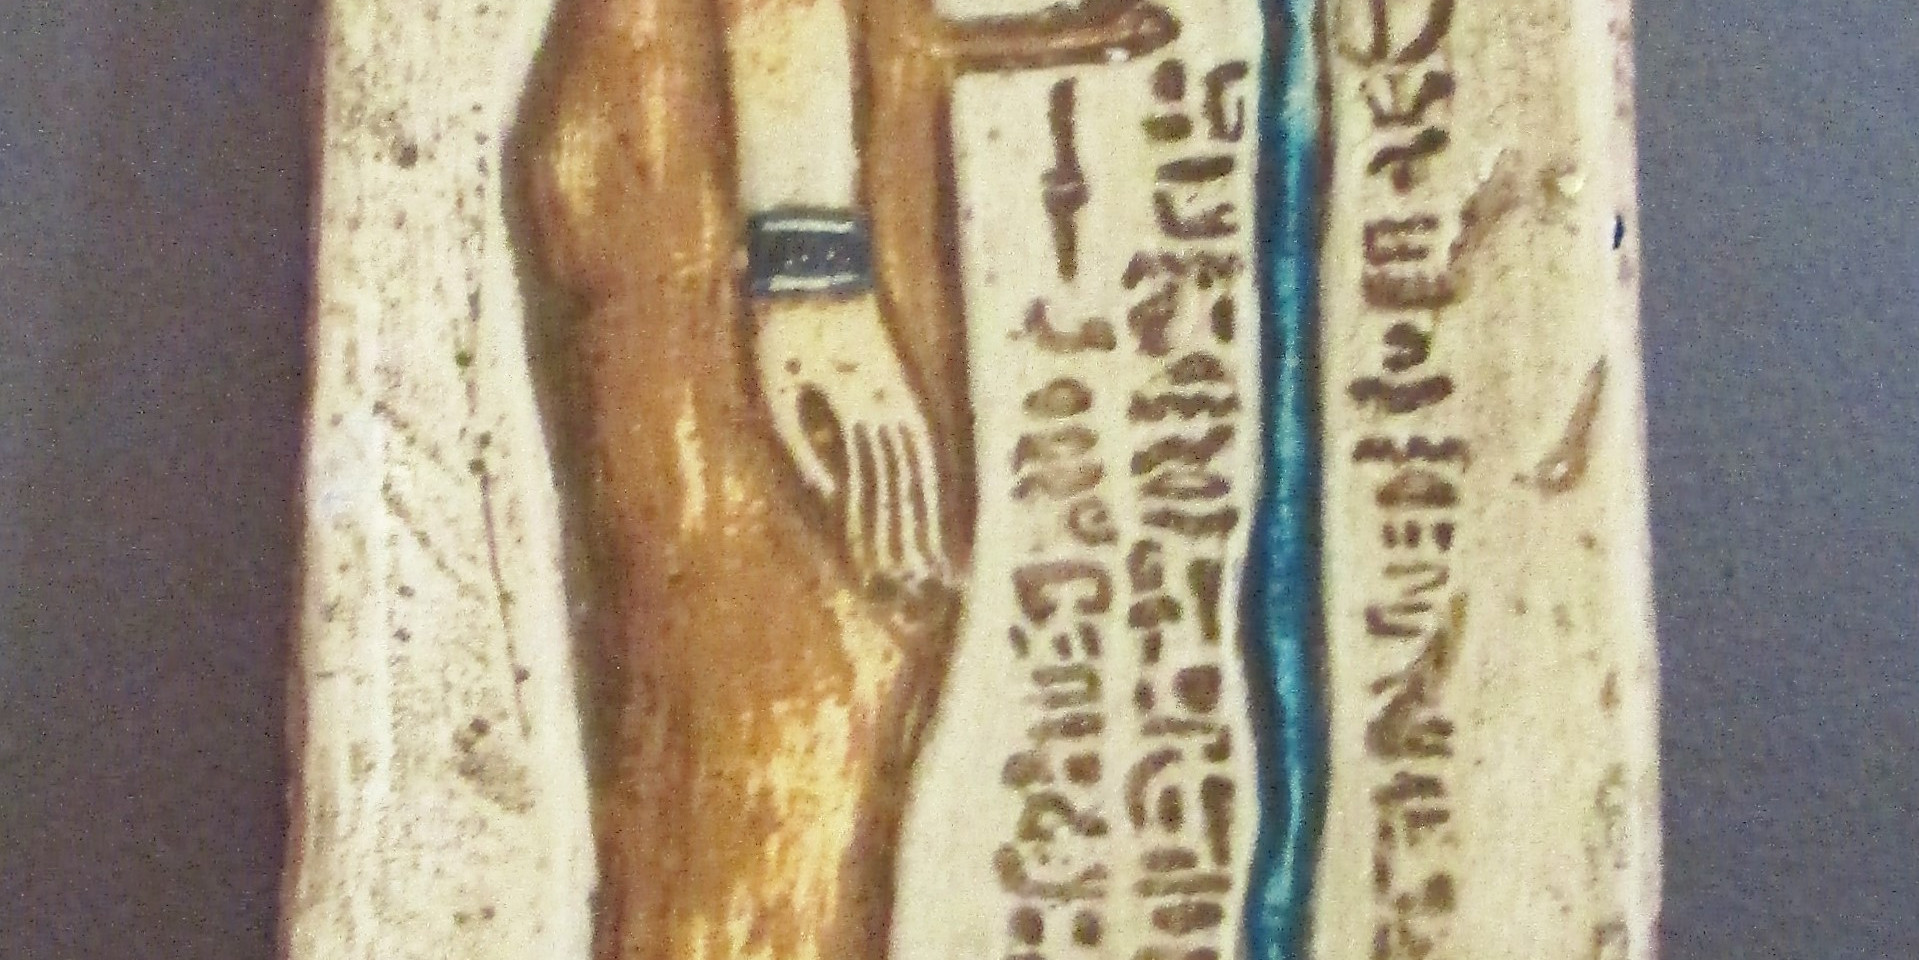 God Geb the Egyptian God of the Earth